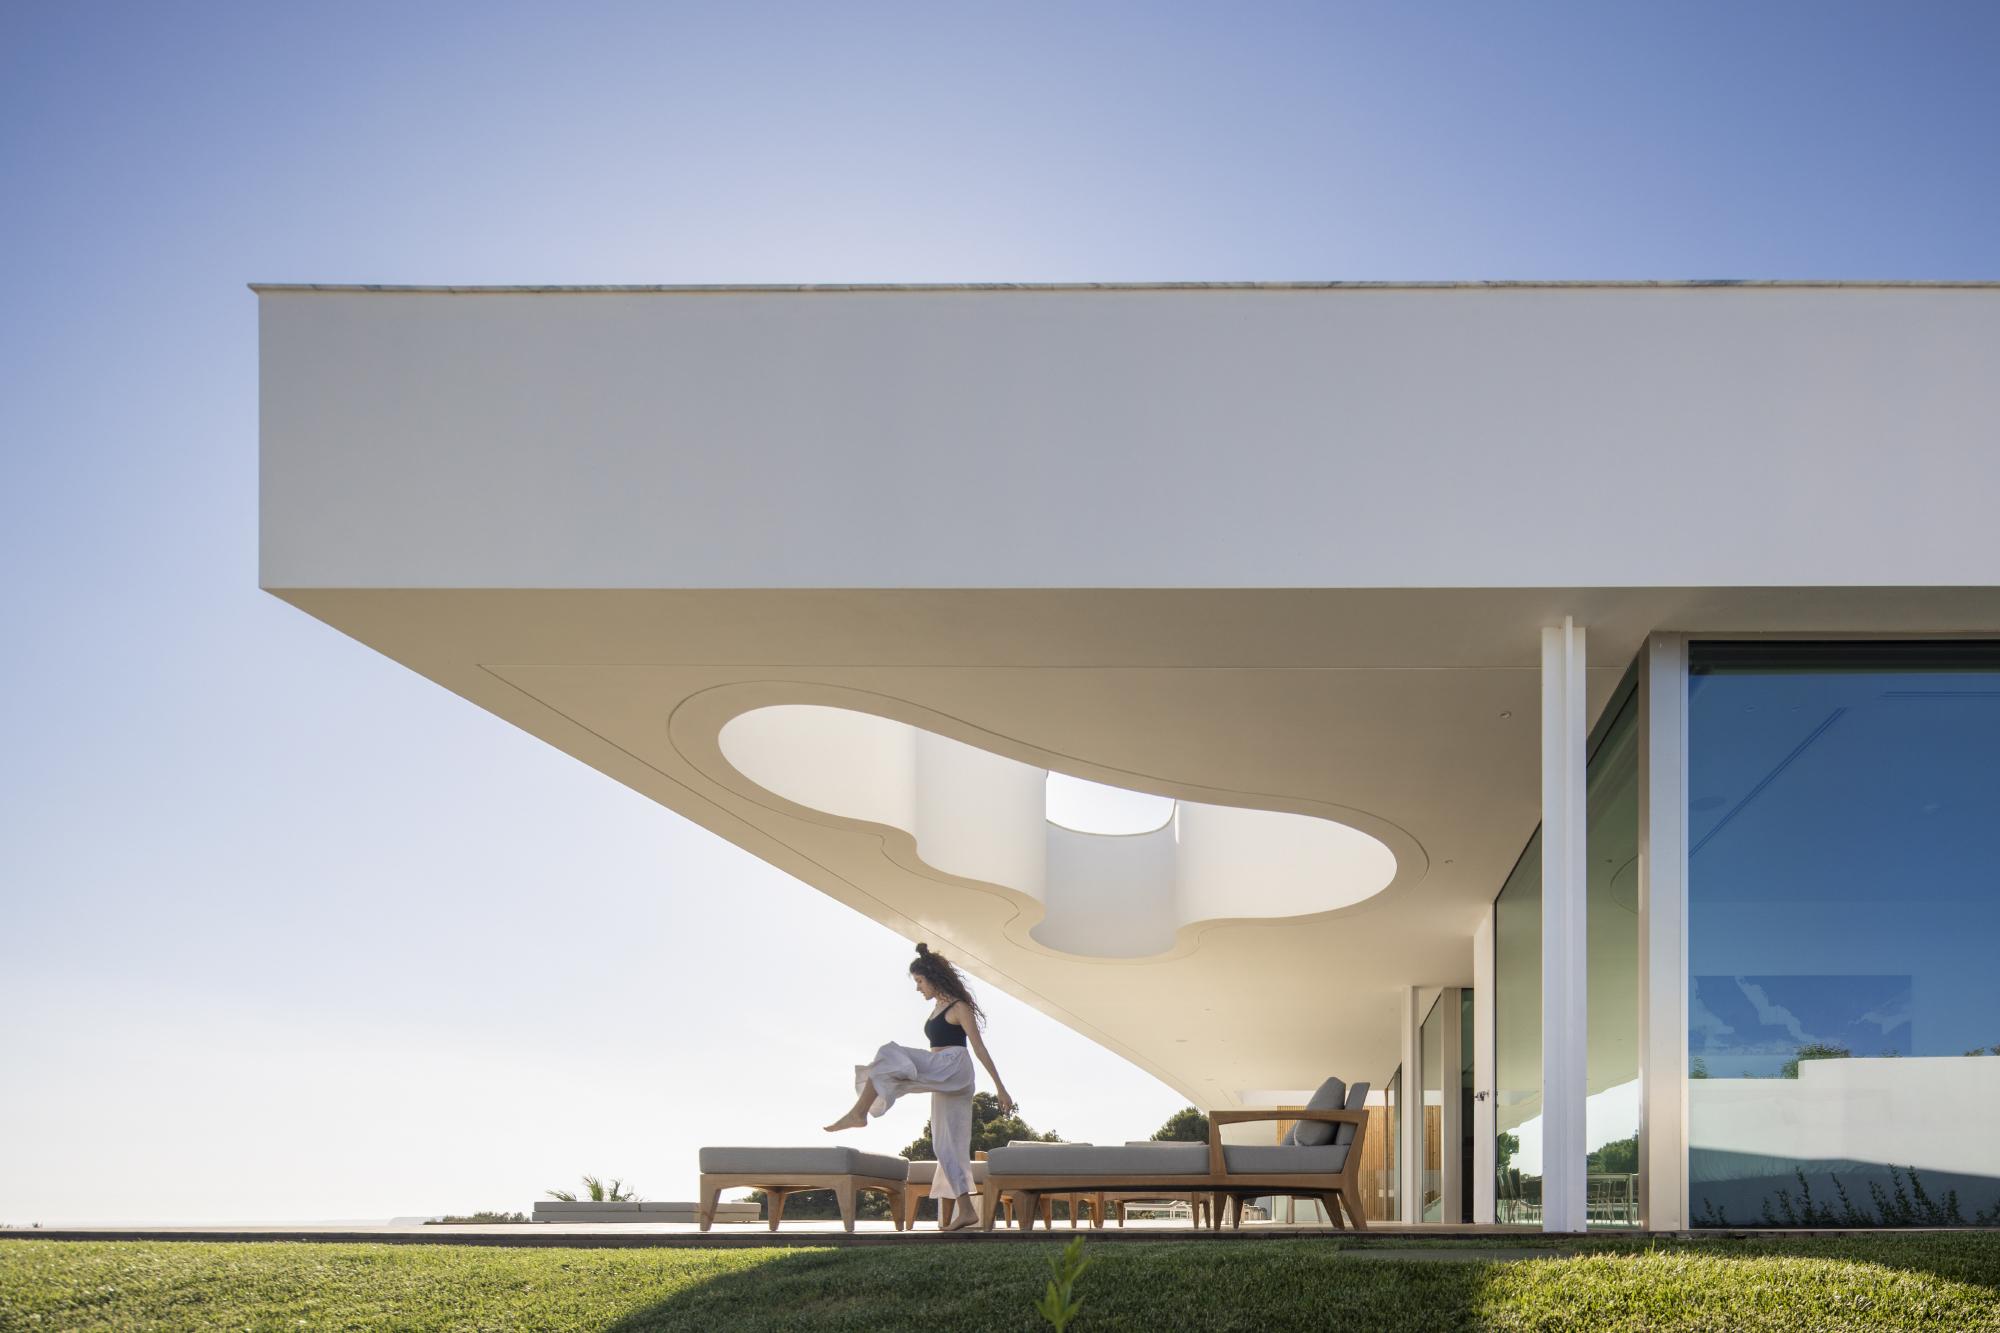 Gallery of LuxMare Houses / Mário Martins Atelier - 1